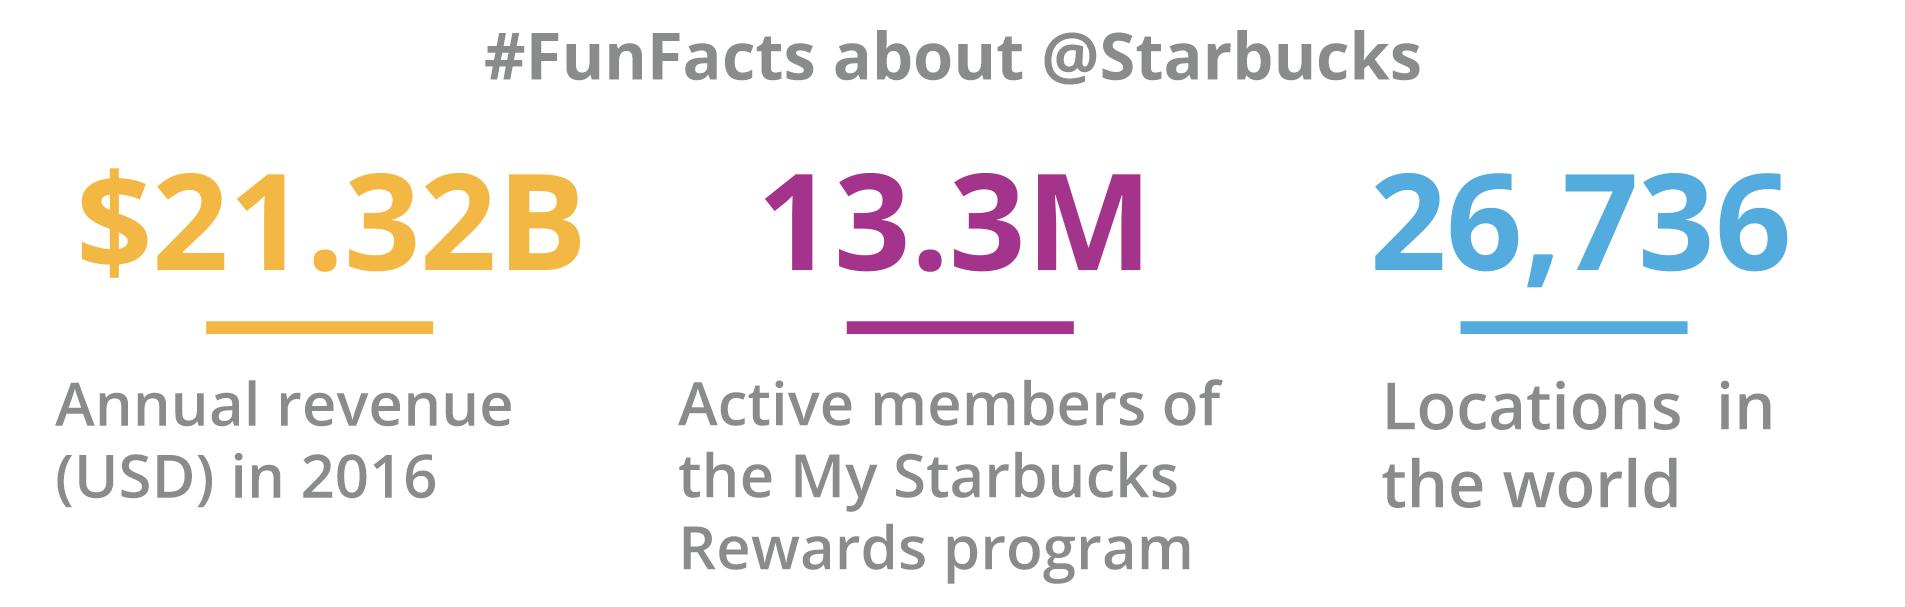 Starbucks stats